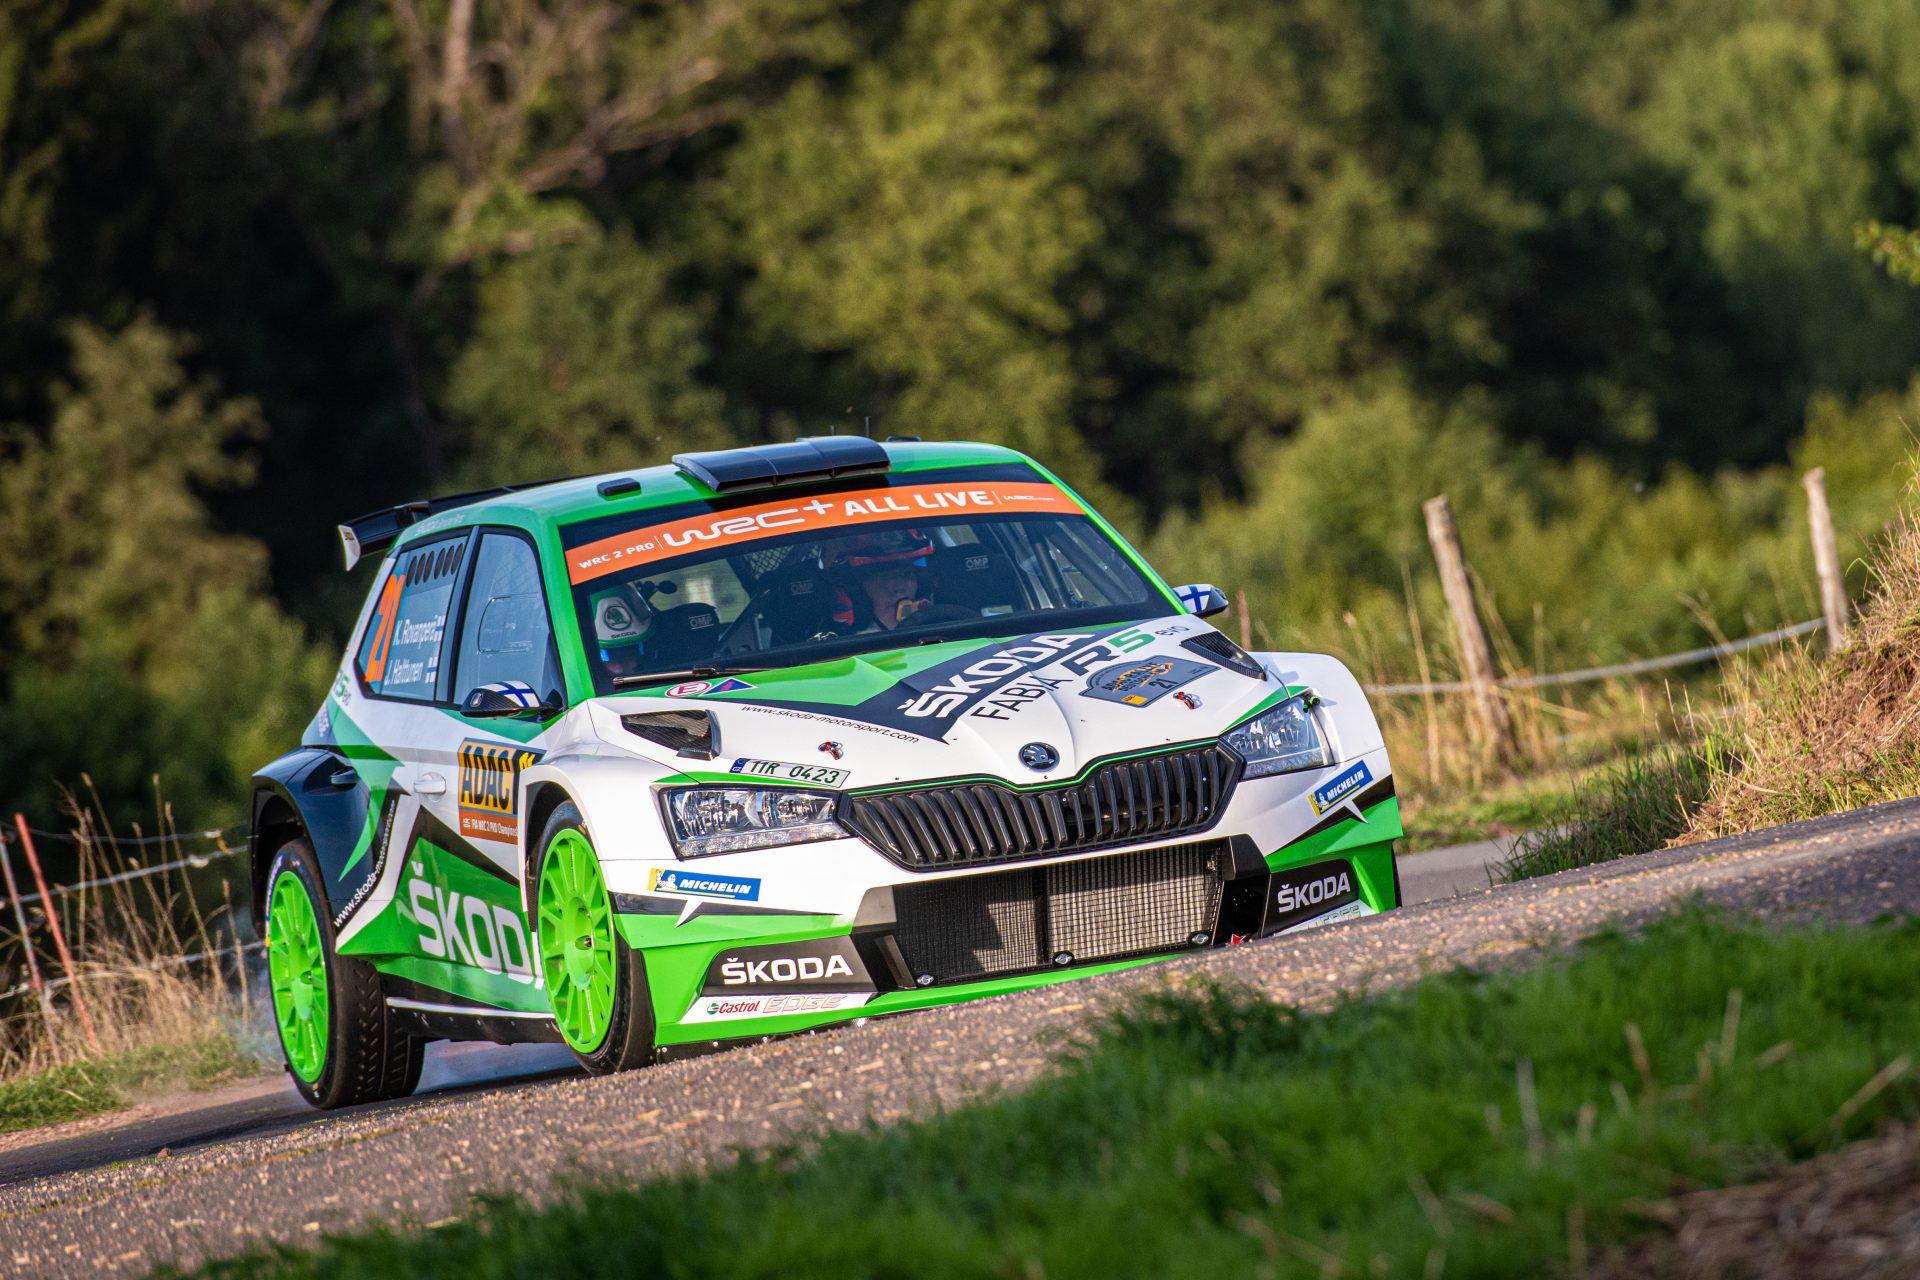 Rallye Deutschland 2019: Latest News and Results